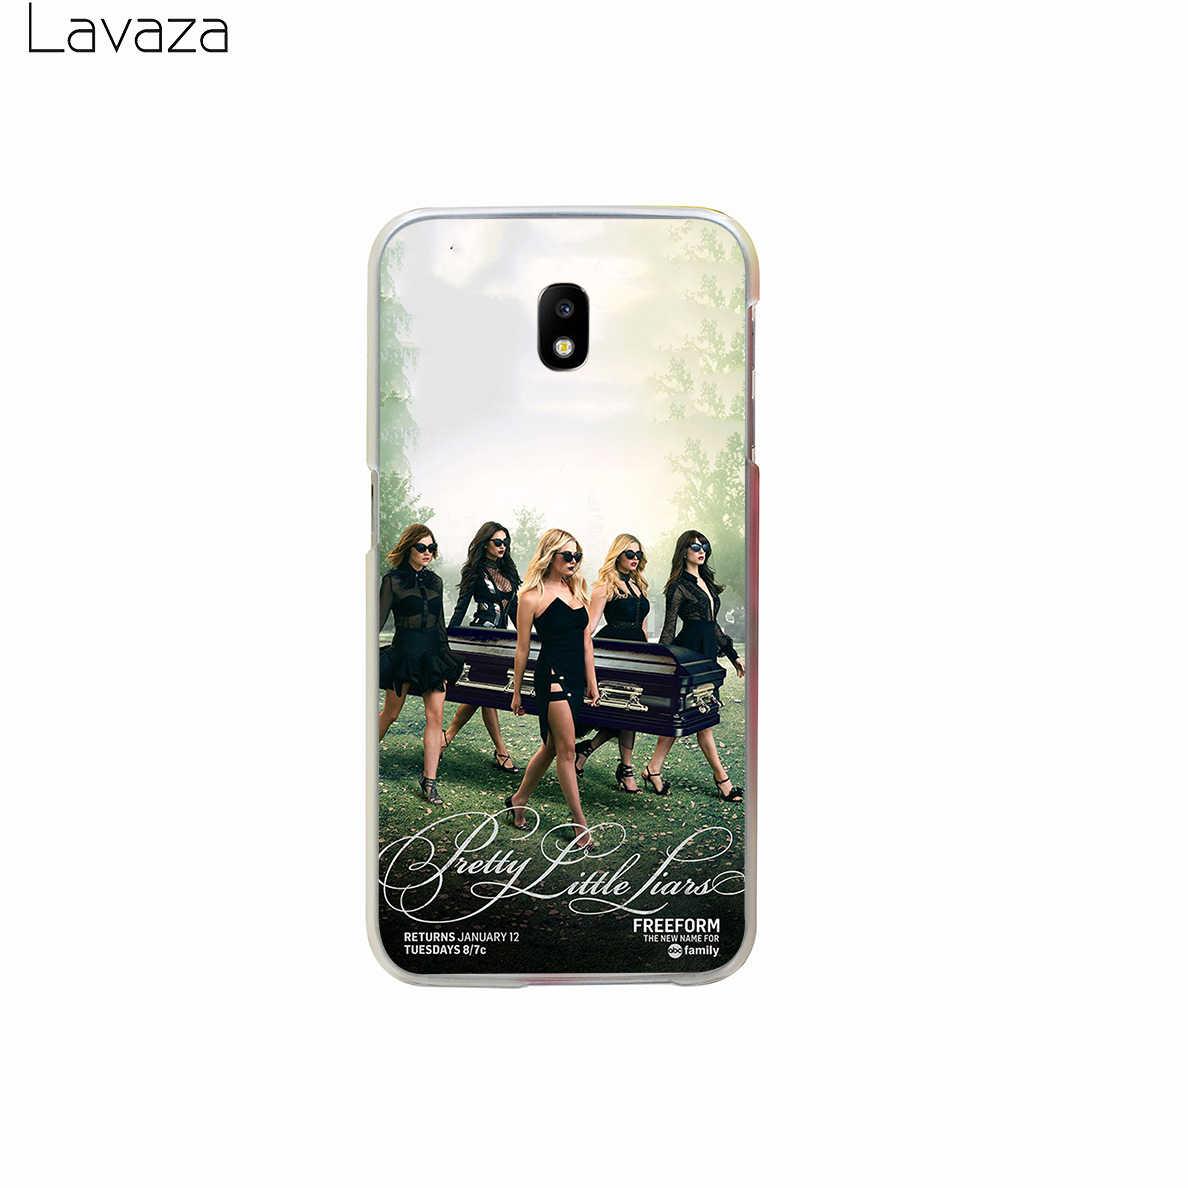 Lavaza надписью Pretty Little Liars и жесткий чехол для телефона для samsung Galaxy J8 J7 Duo J4 J5 J6 плюс 2018 2017 2016 J2 J3 Prime 2015 Крышка